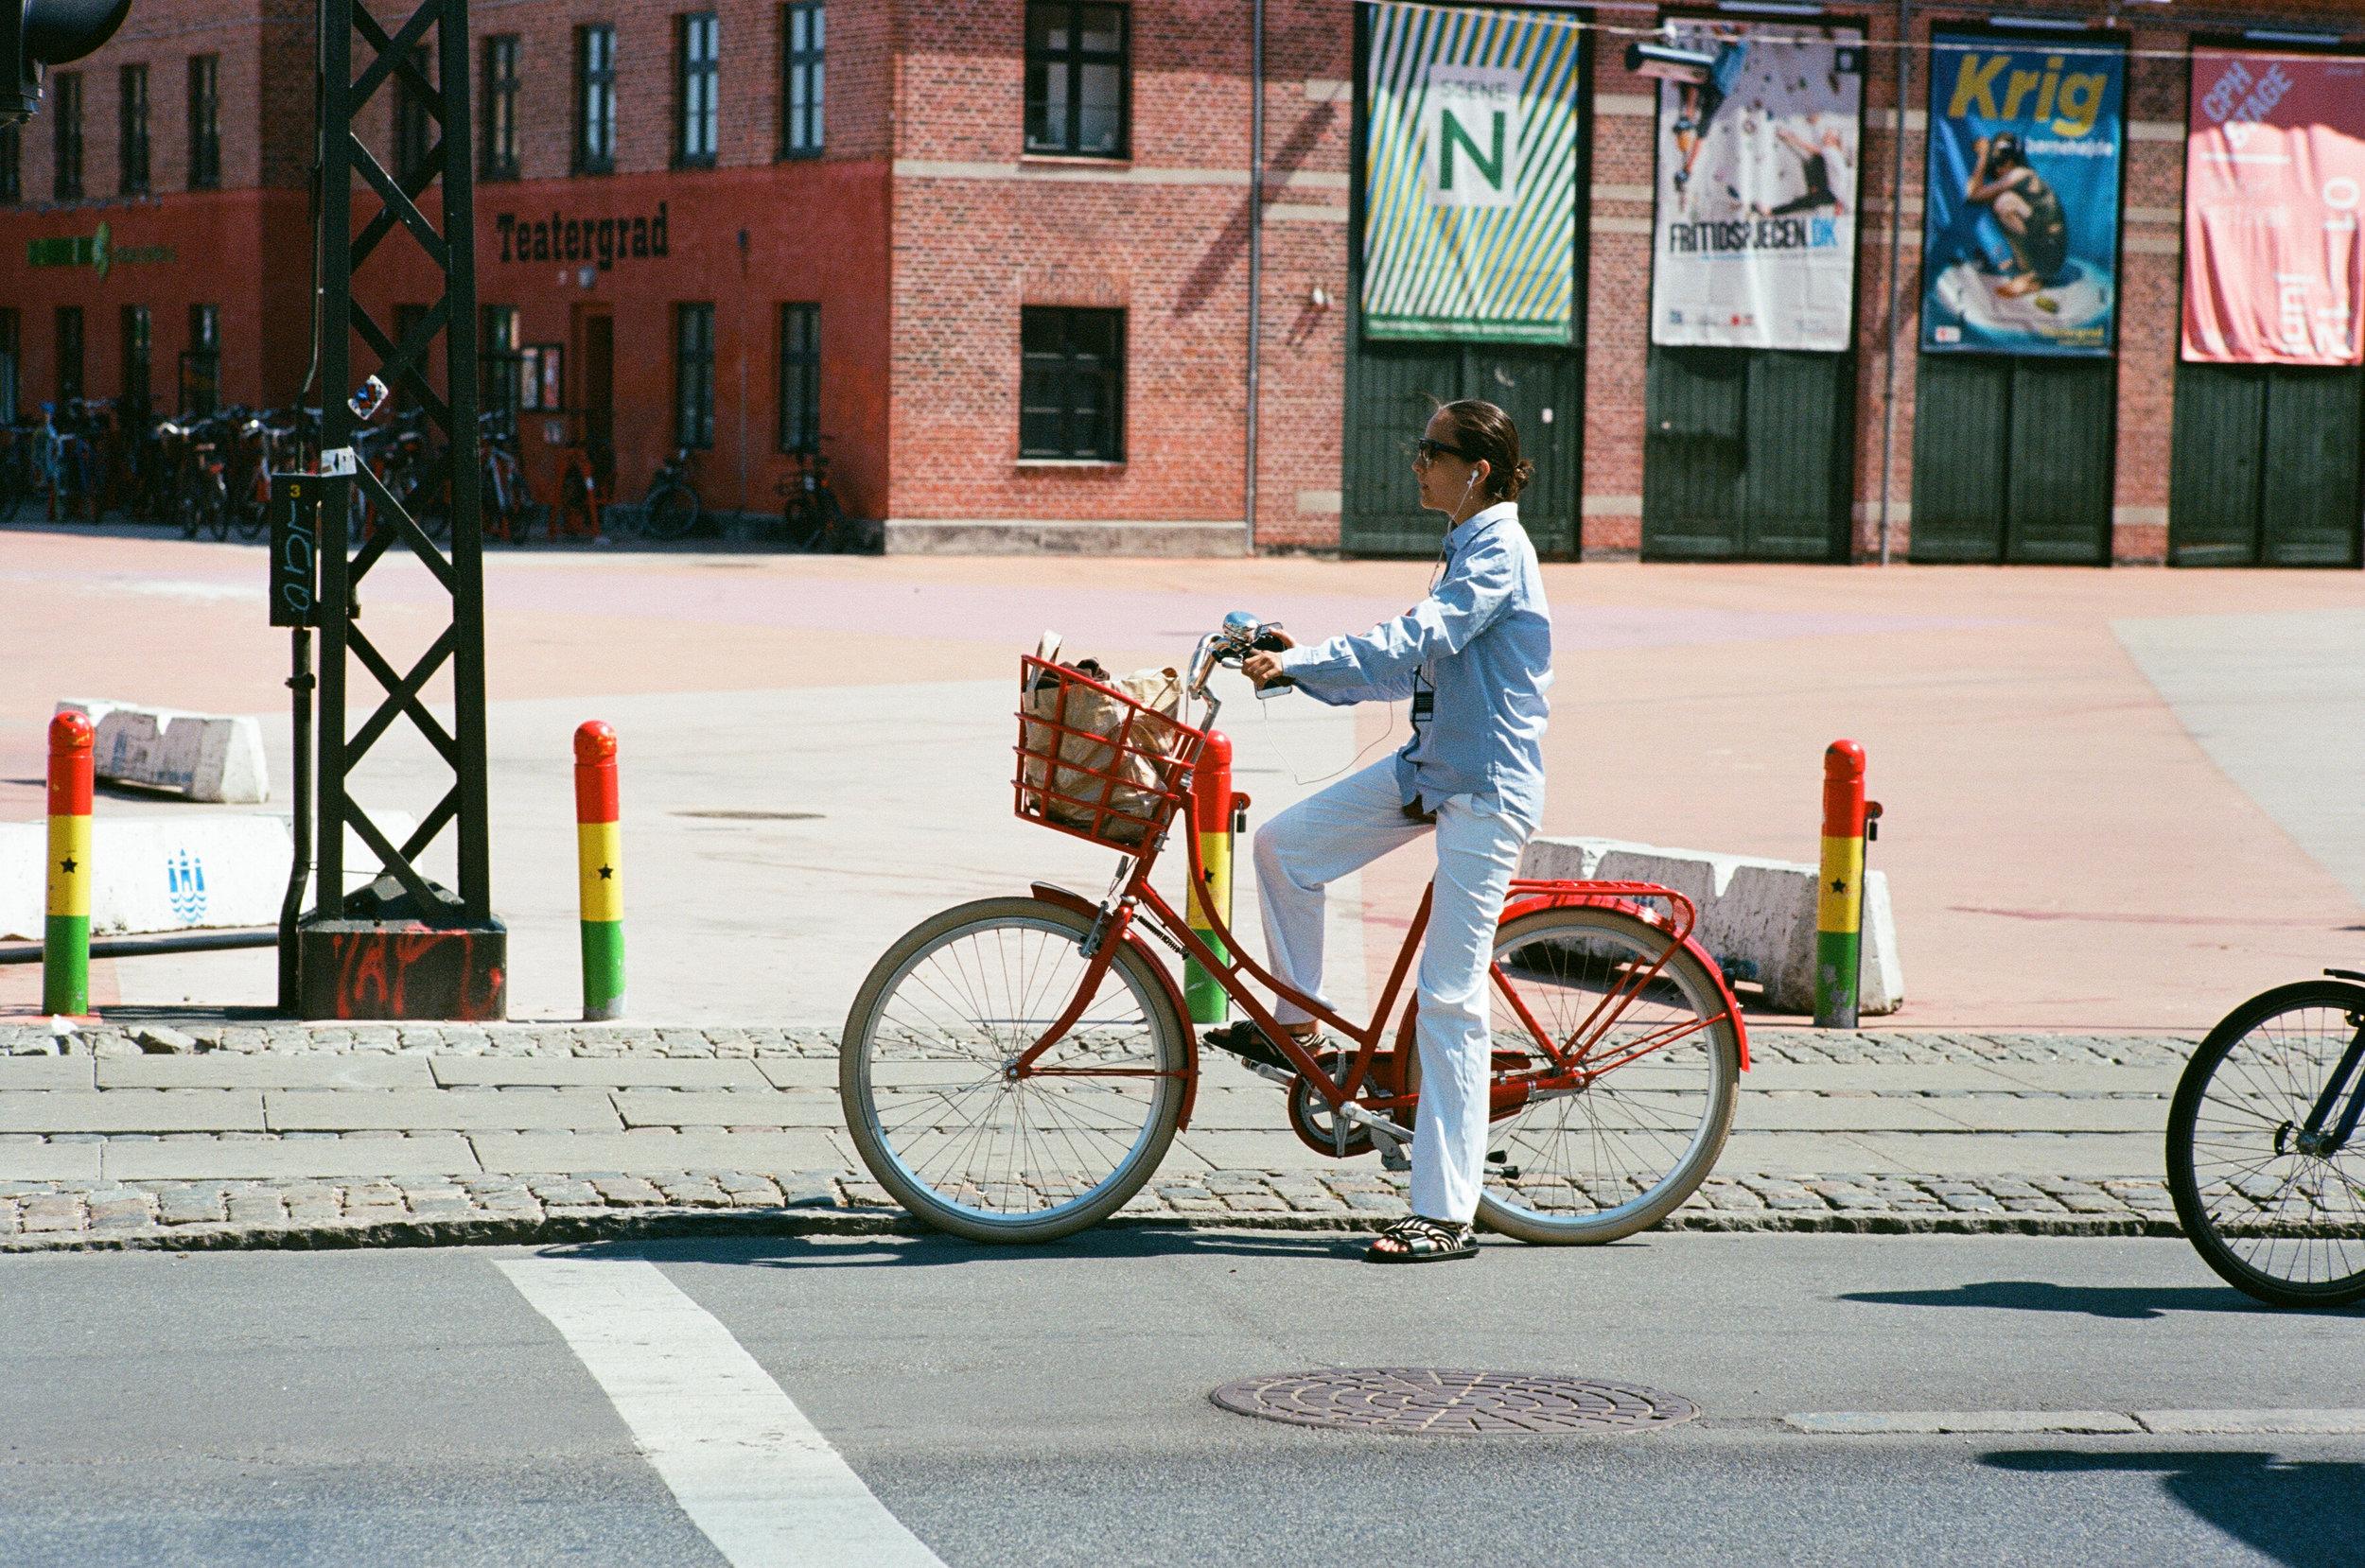 Jean Claude Billmaier - Lifestyle -22720020.jpg